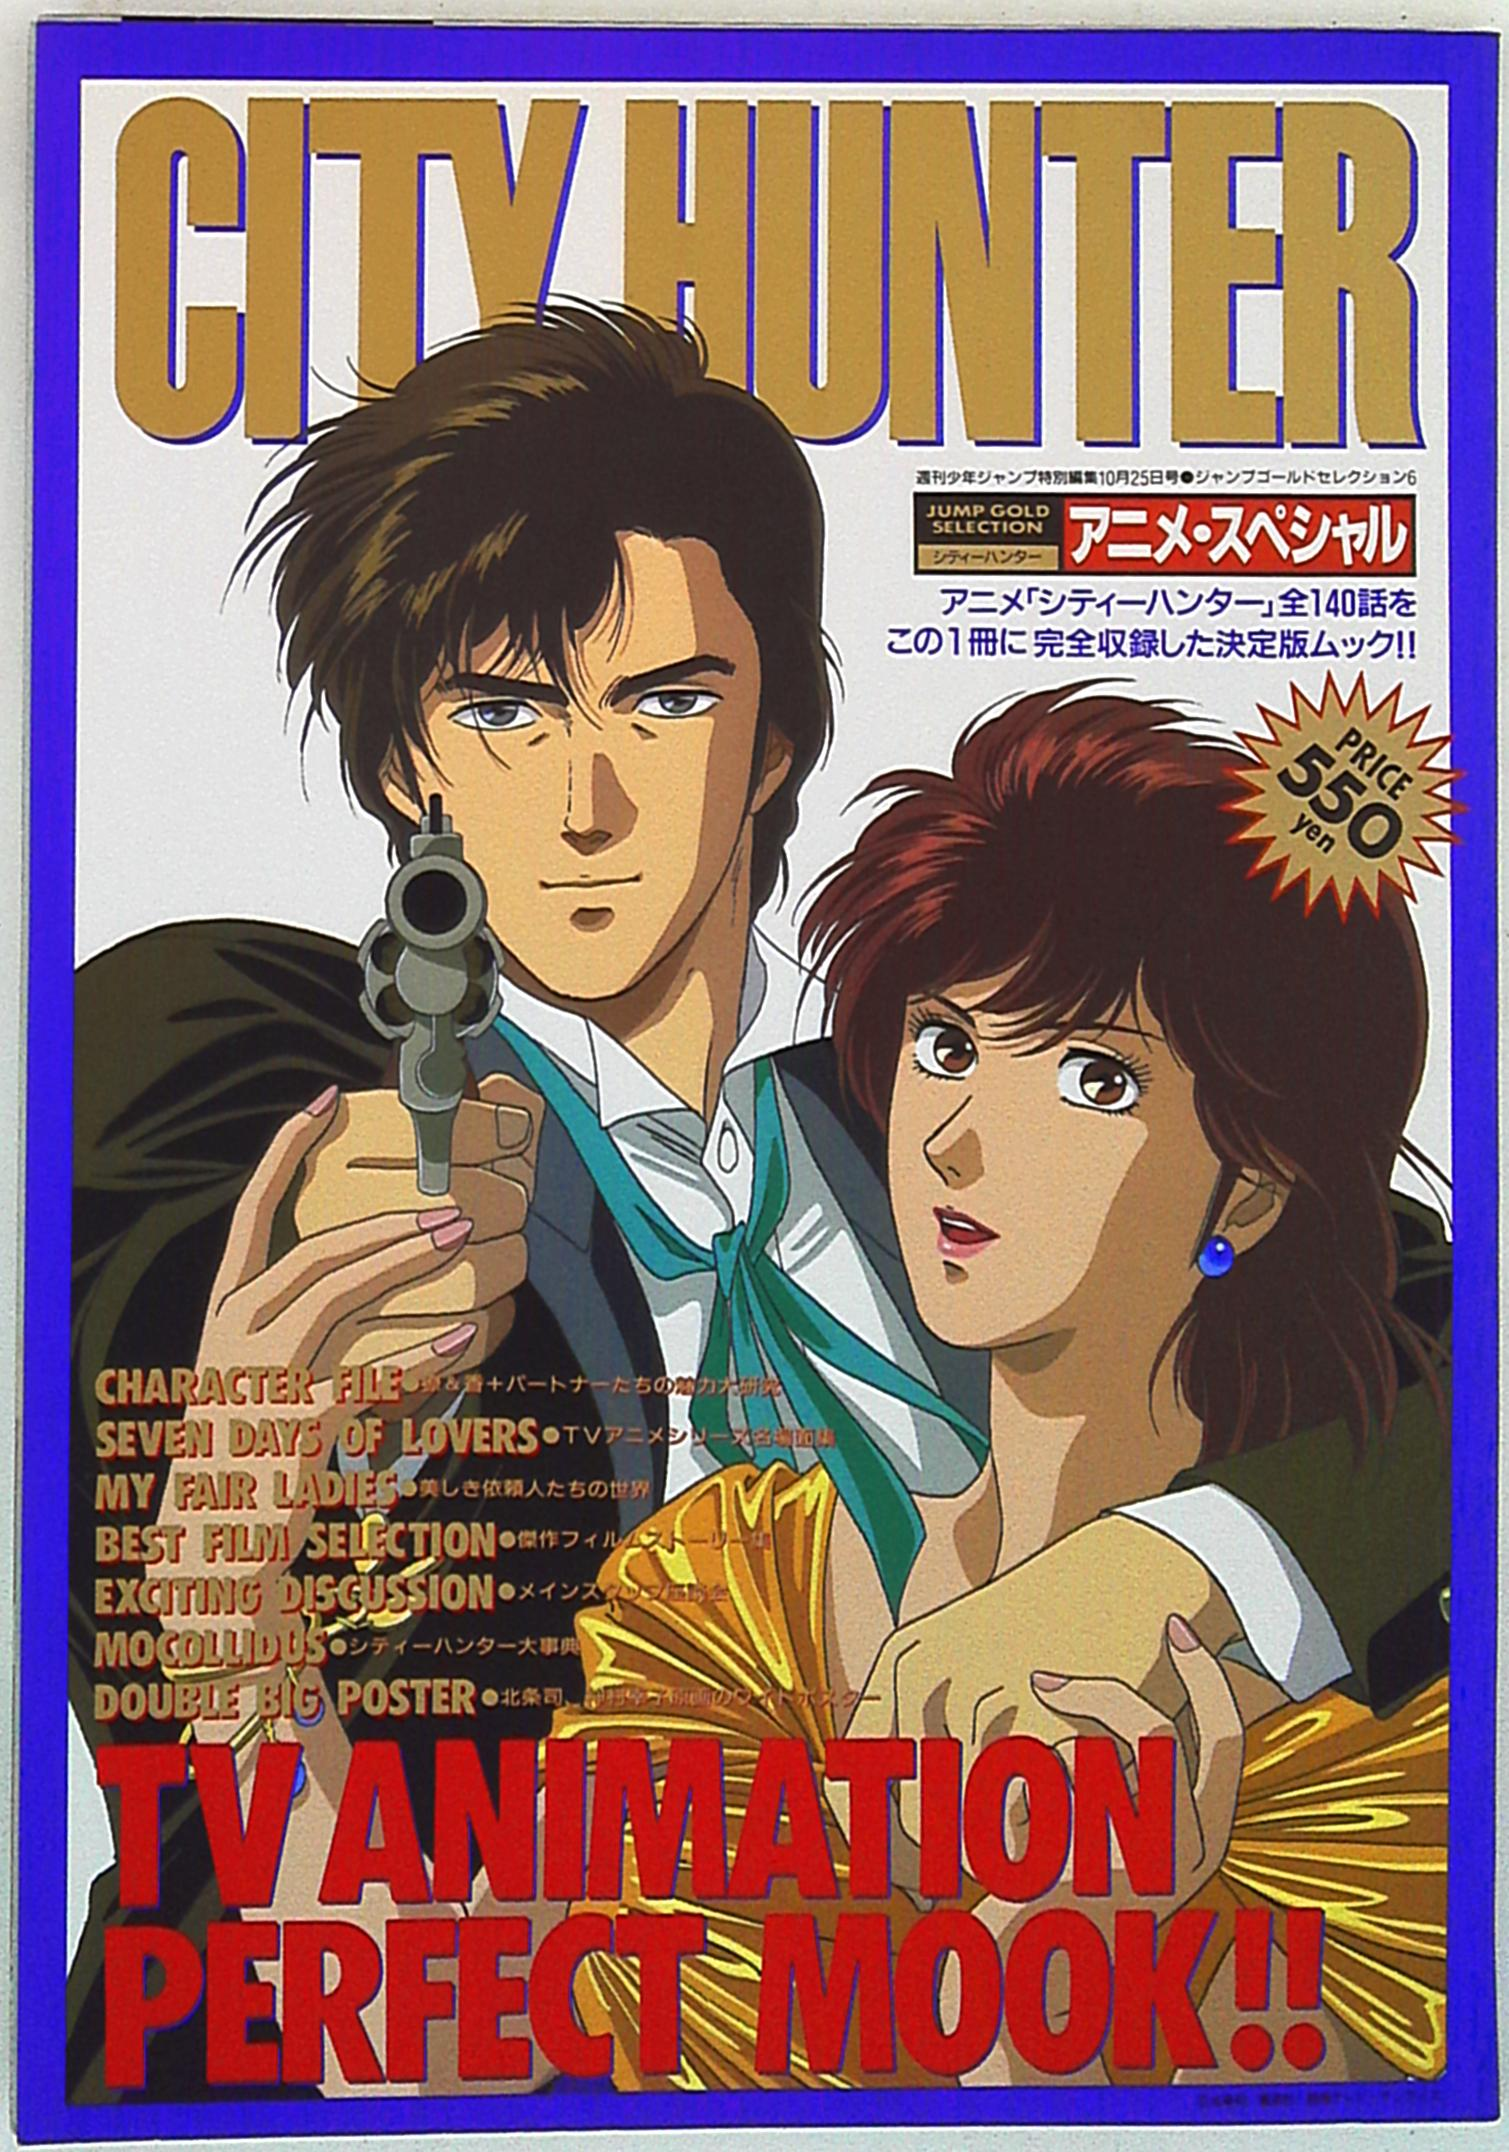 Mandarake Shueisha Jump Gold Collection City Hunter Anime Special